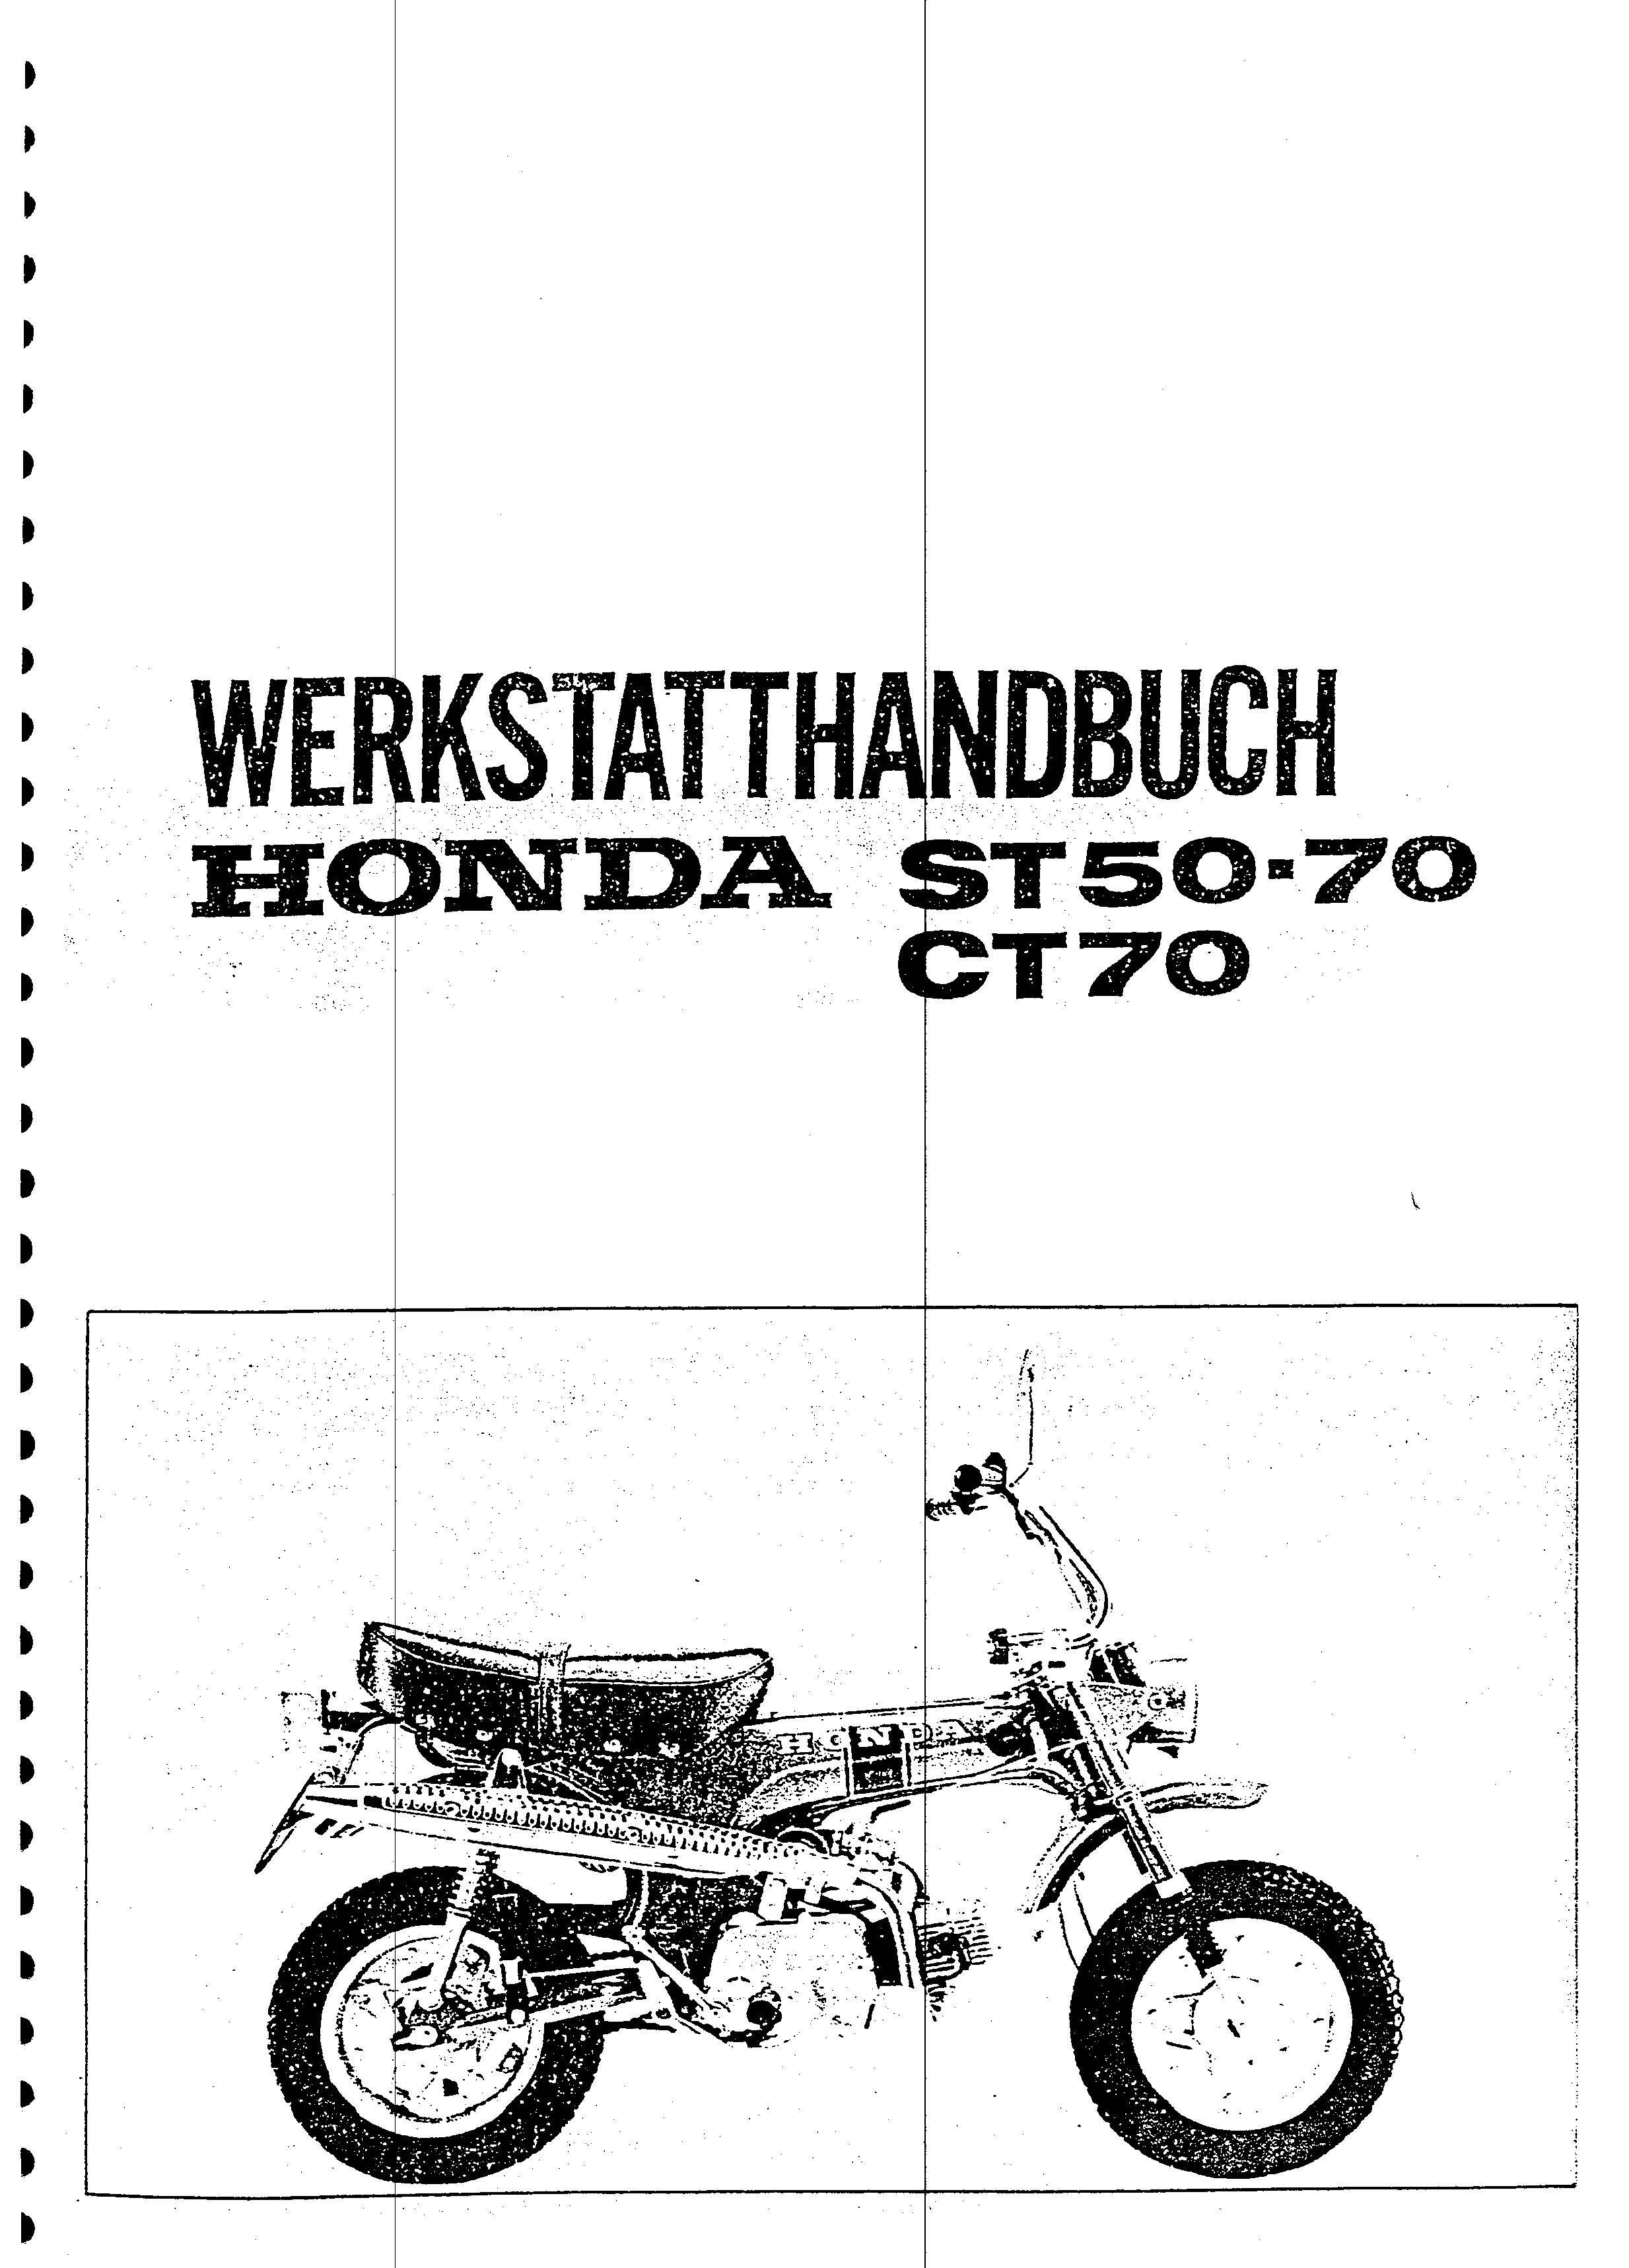 Workshop Manual for Honda ST50 (German)